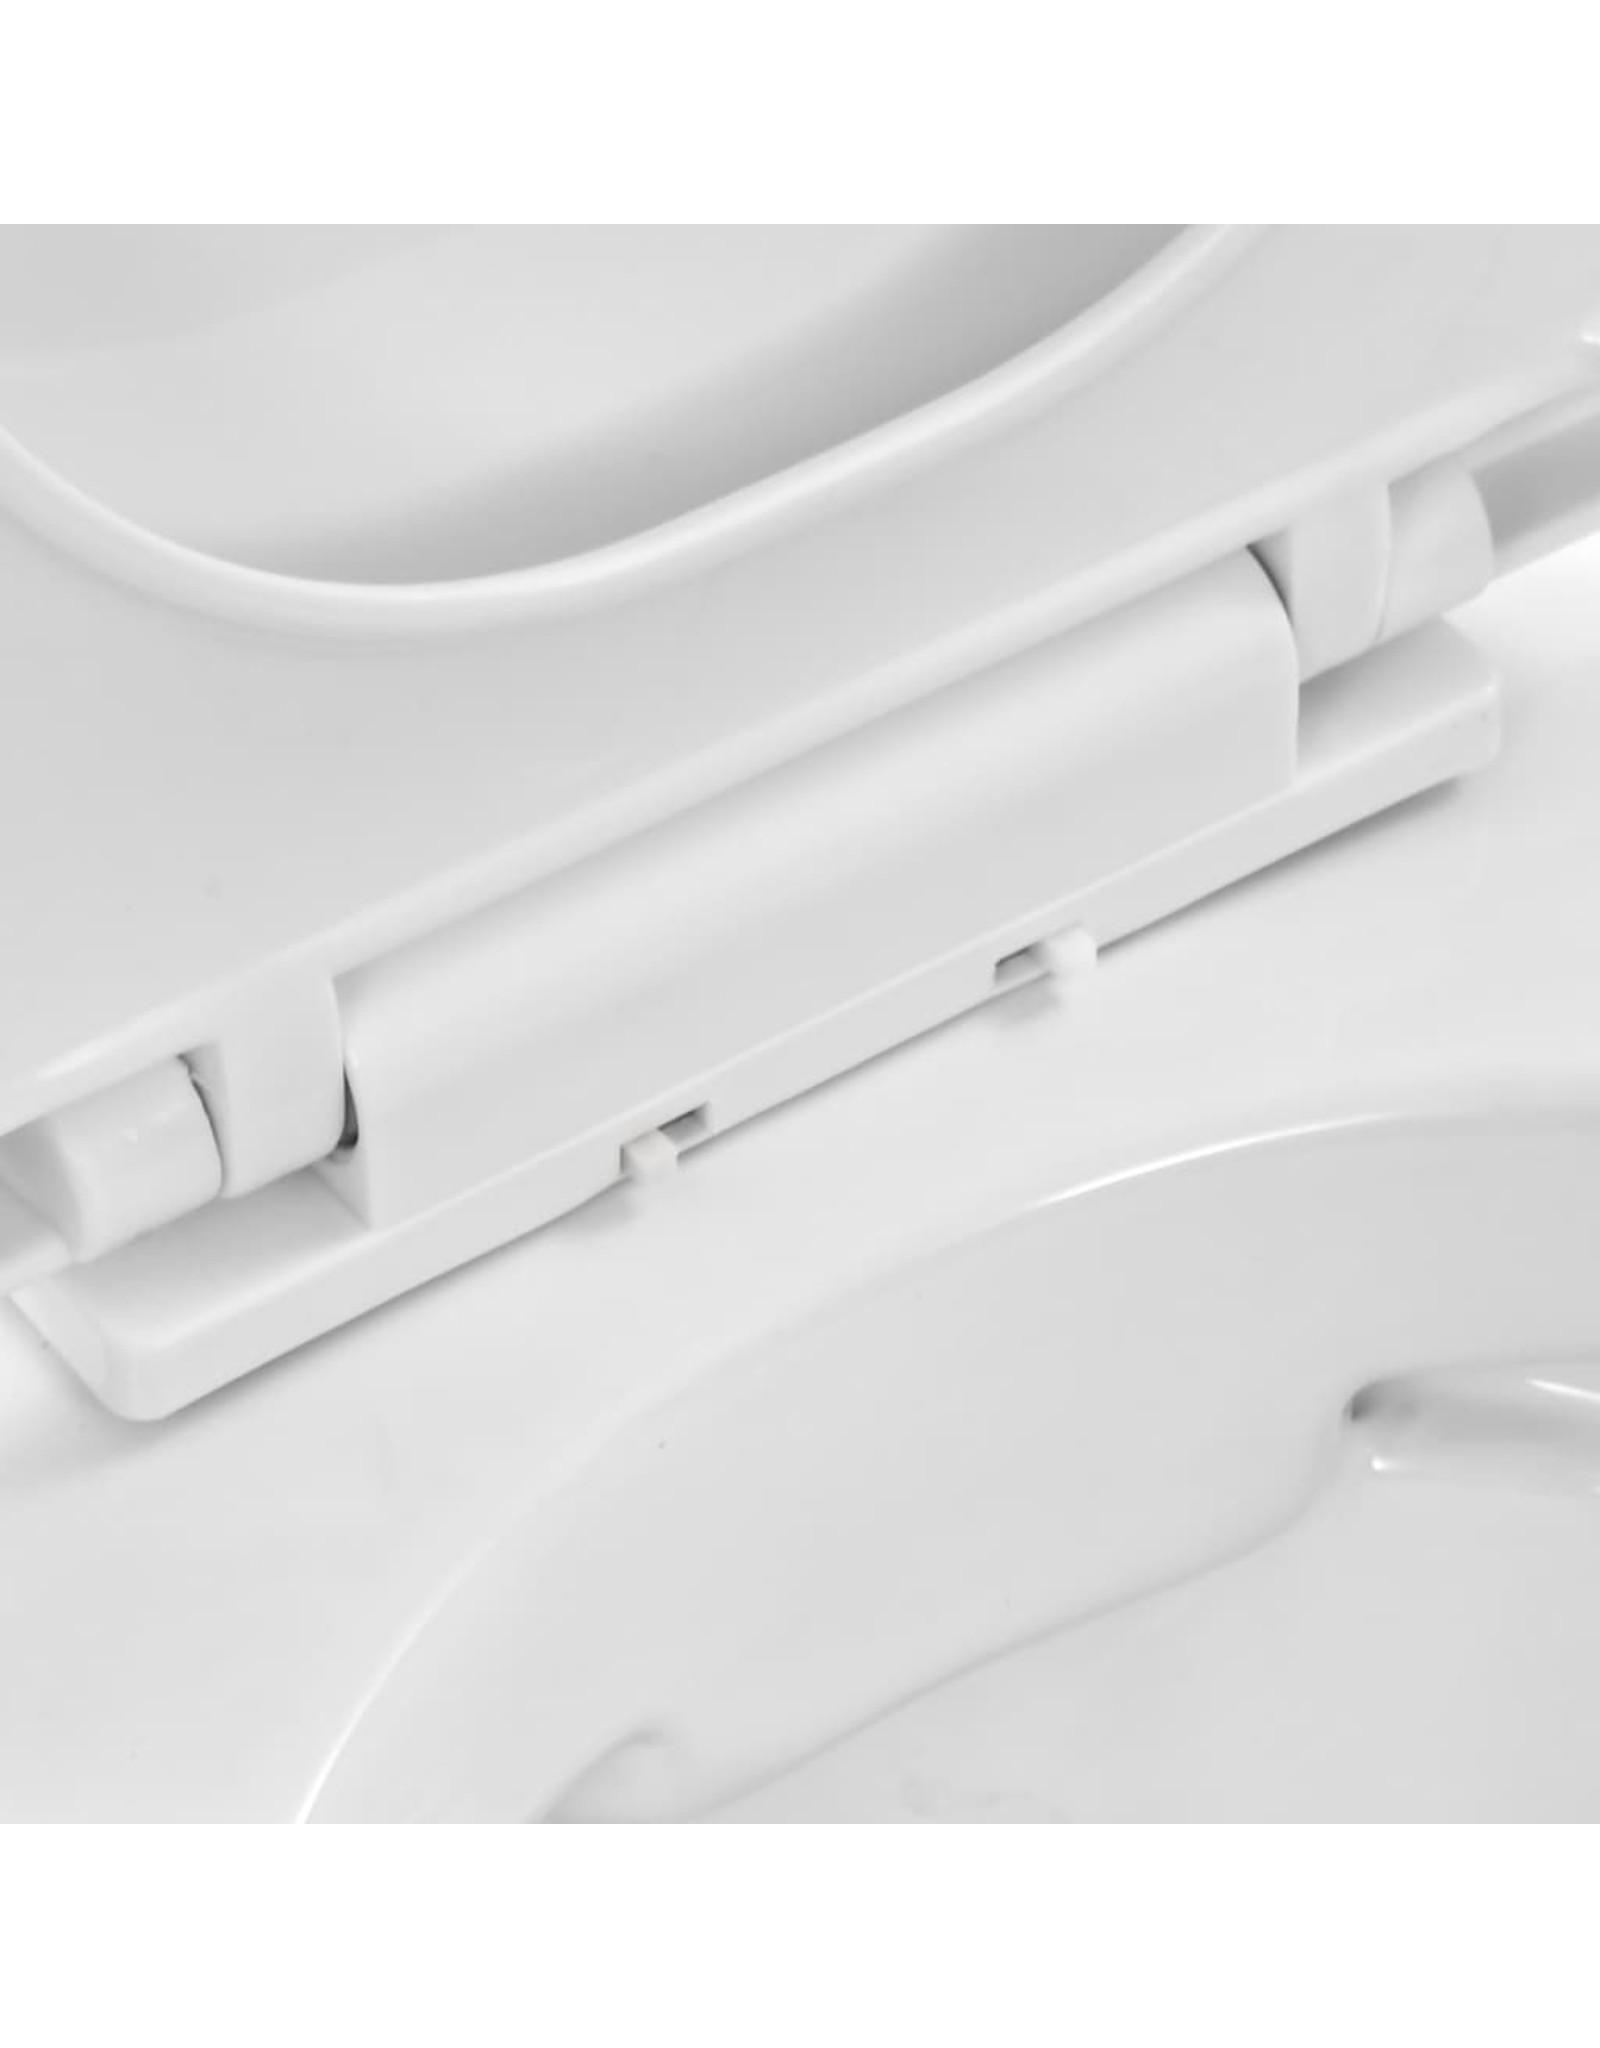 Hangend toilet randloos keramiek wit